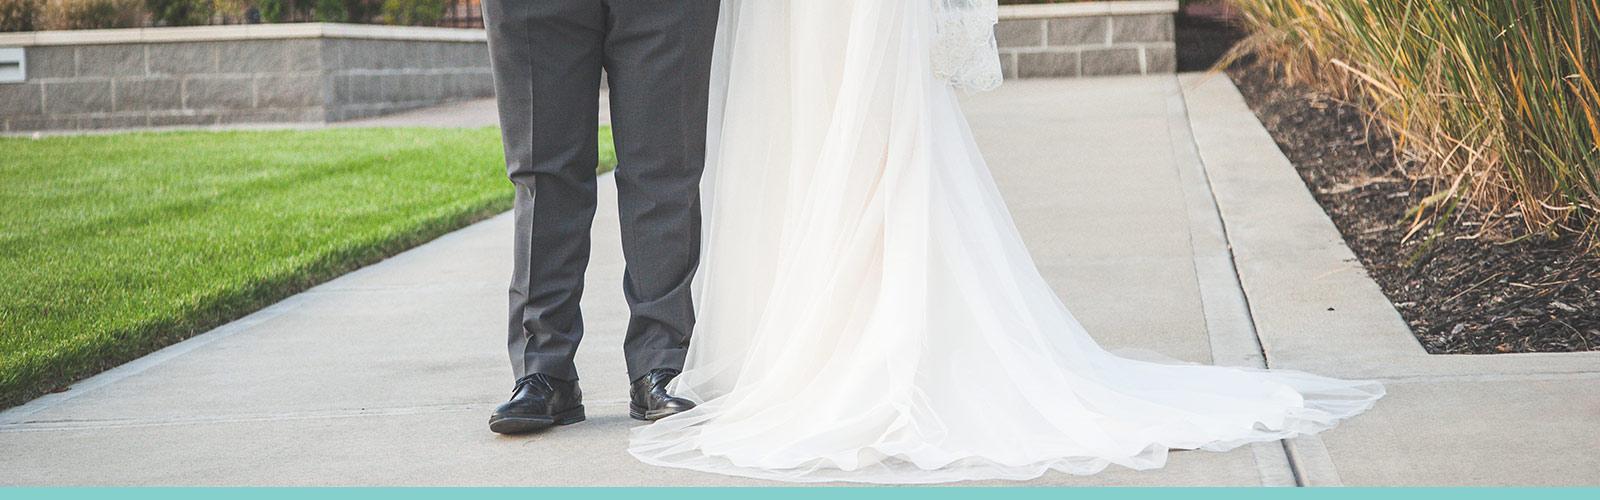 blog-2018-weddingitinerary5.jpg